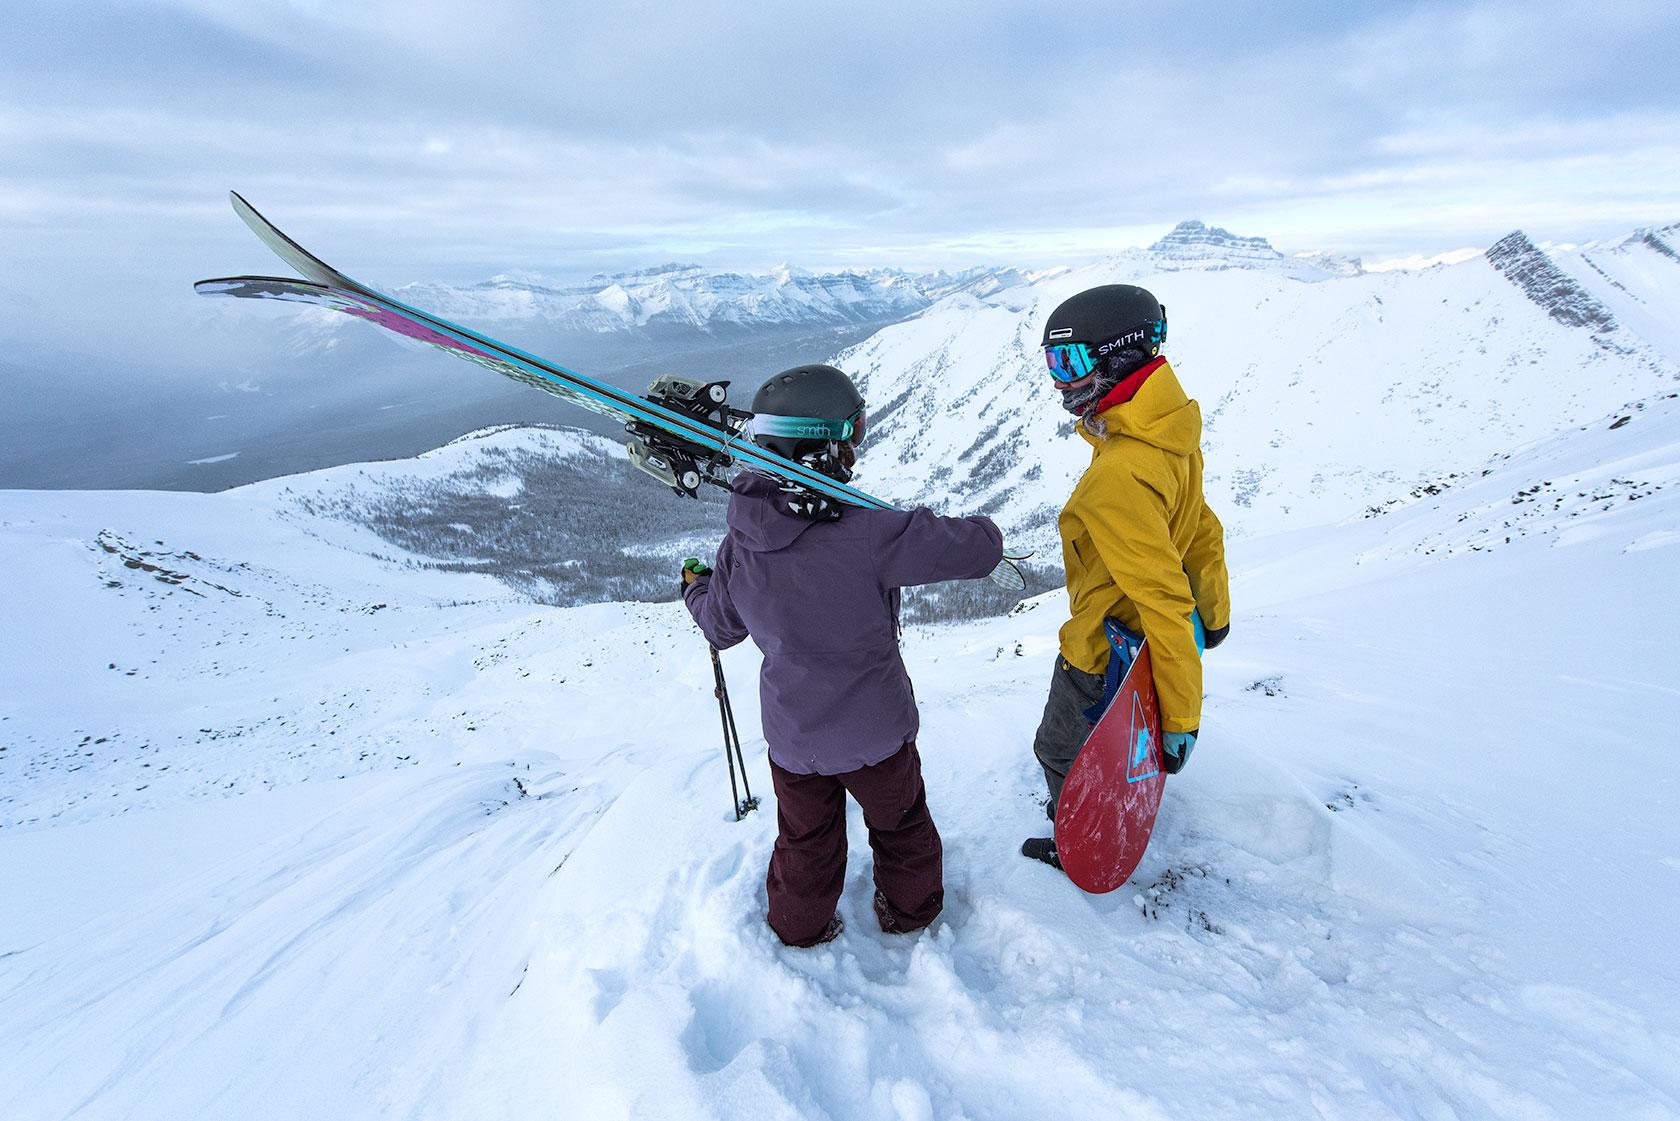 austin-trigg-patagonia-banff-alberta-winter-canada-lifestyle-adventure-mountains-lake-louise-resort-valley-adventure.jpg